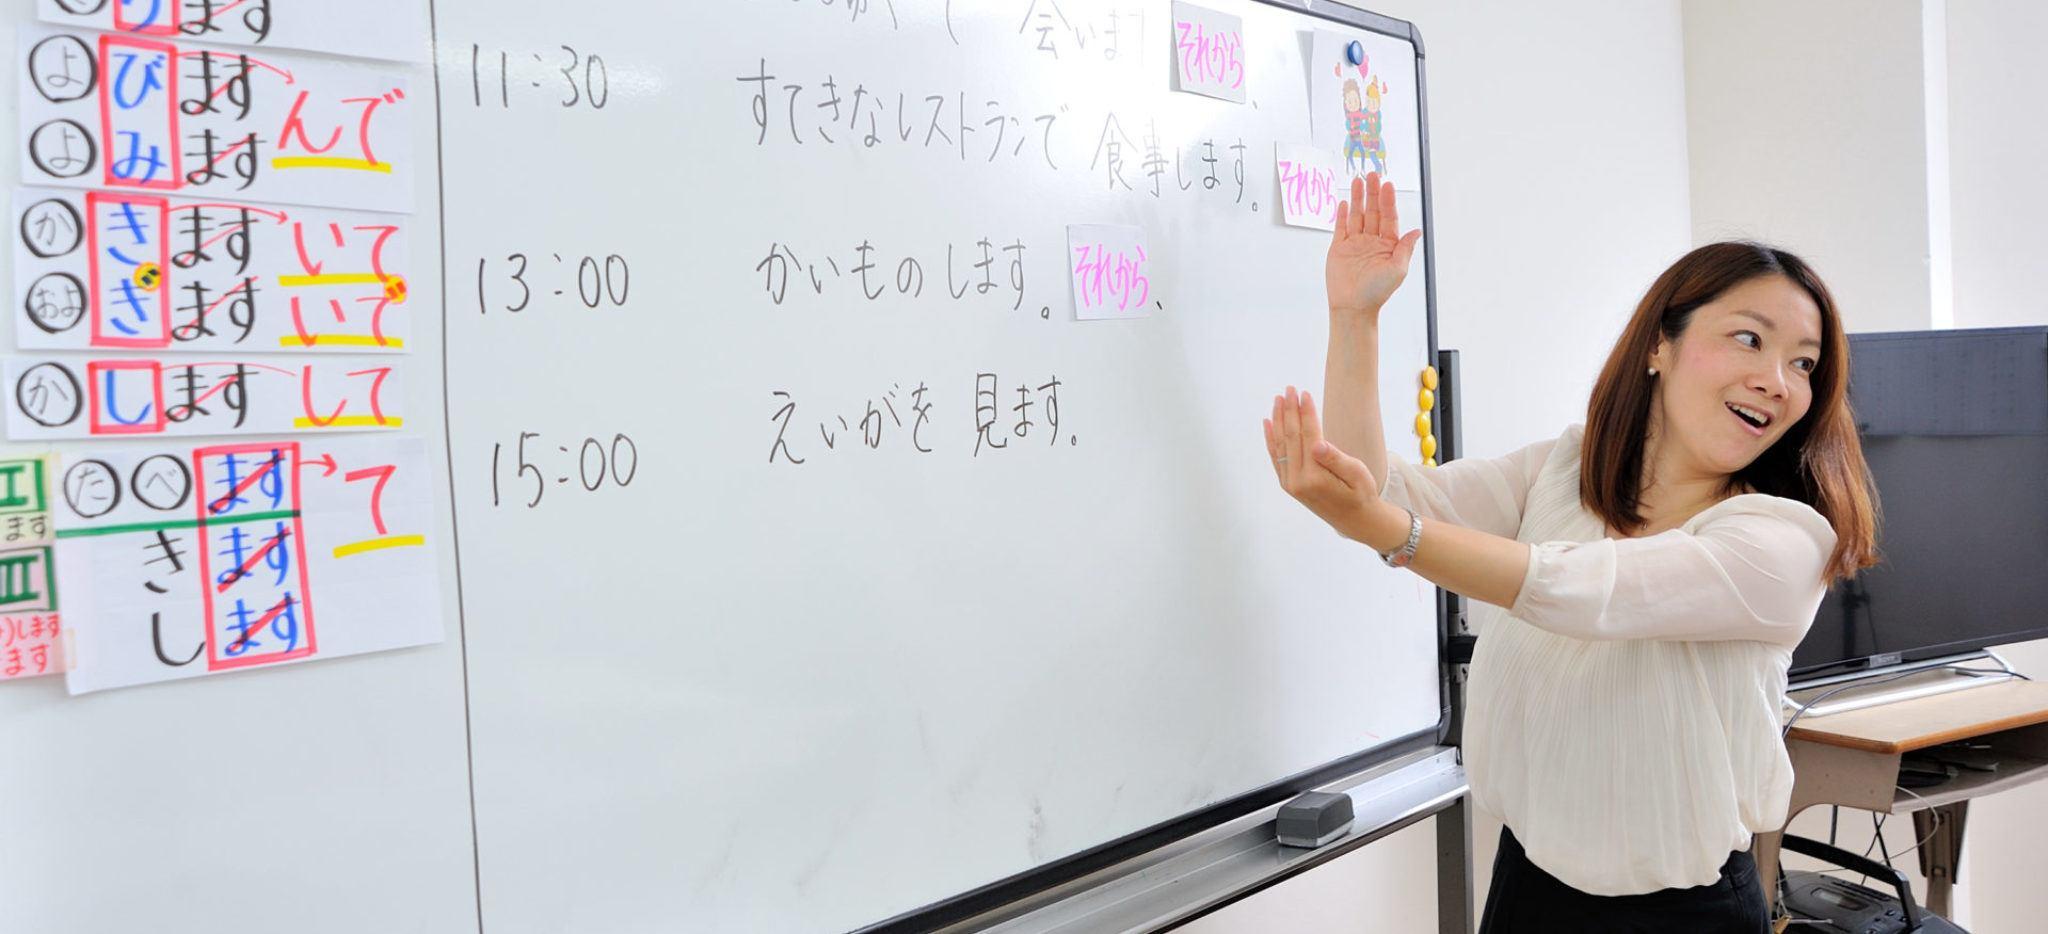 Akamonkai learn japanese online